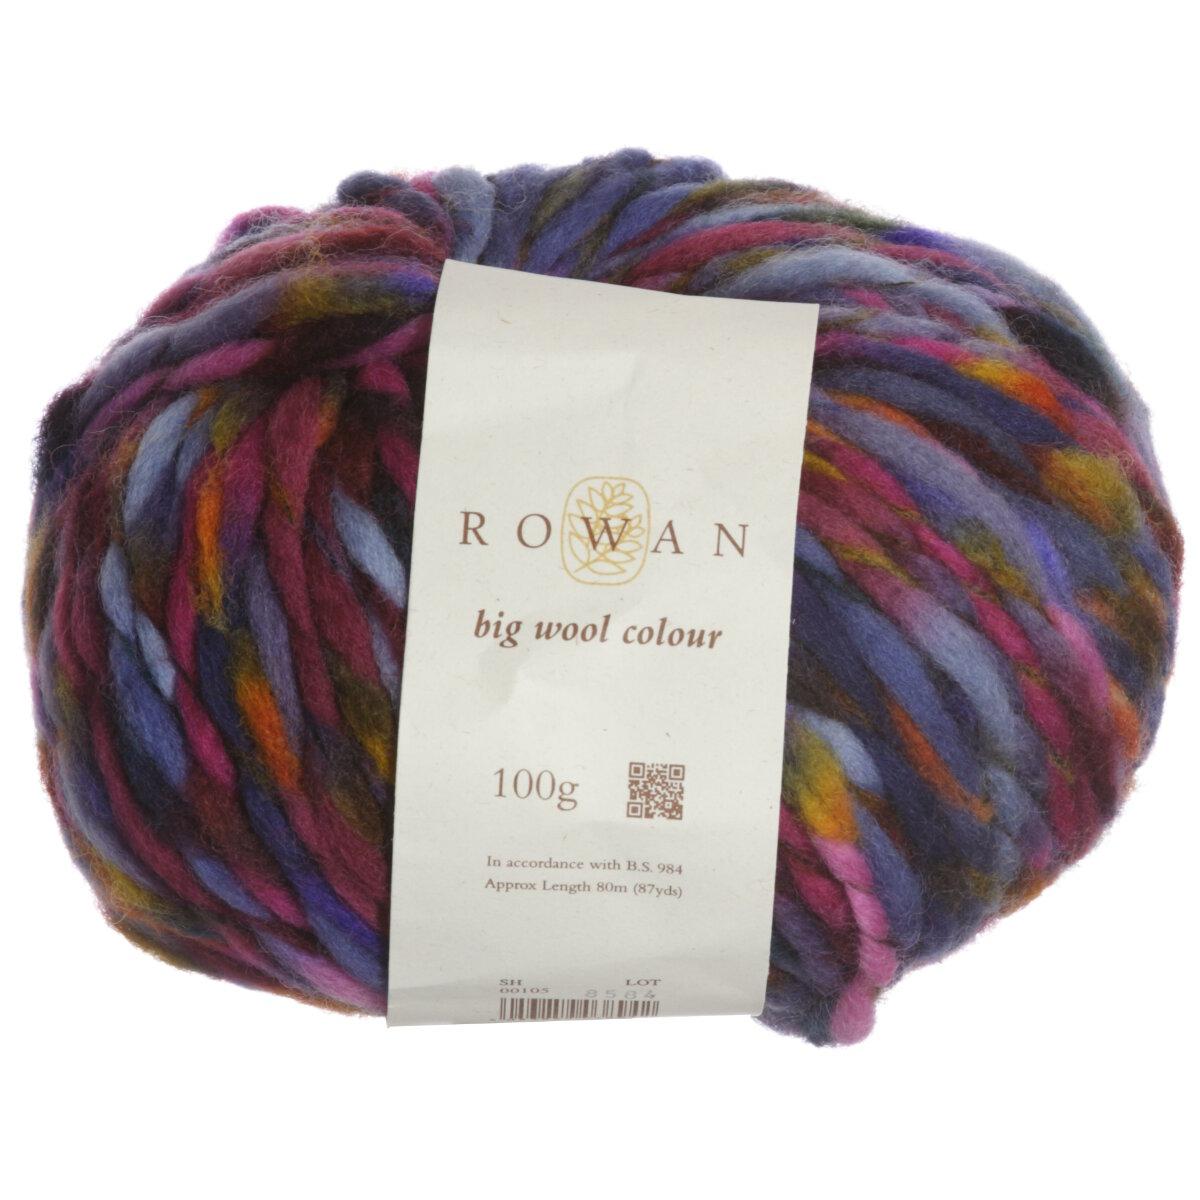 Knitting Patterns For Rowan Big Wool : Rowan Big Wool Colour Yarn - 105 Waltzer at Jimmy Beans Wool